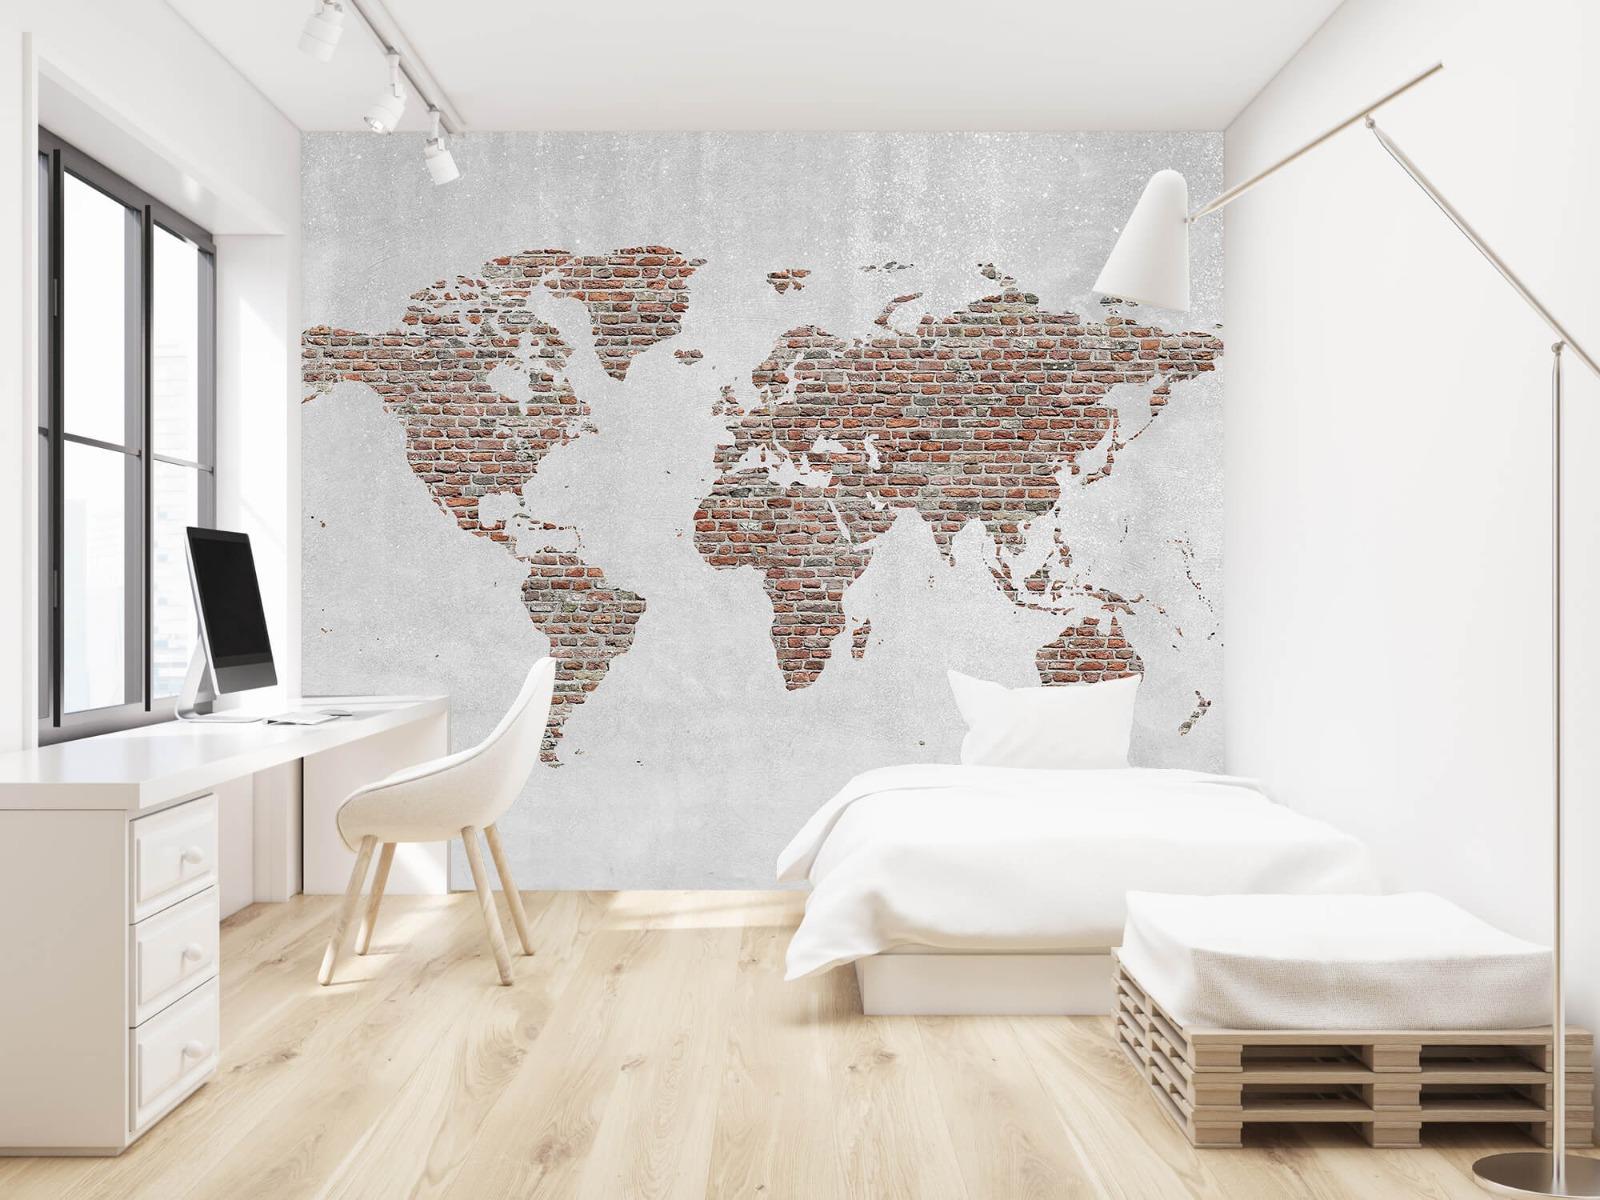 Steen behang - Wereldkaart stenen - Slaapkamer 22